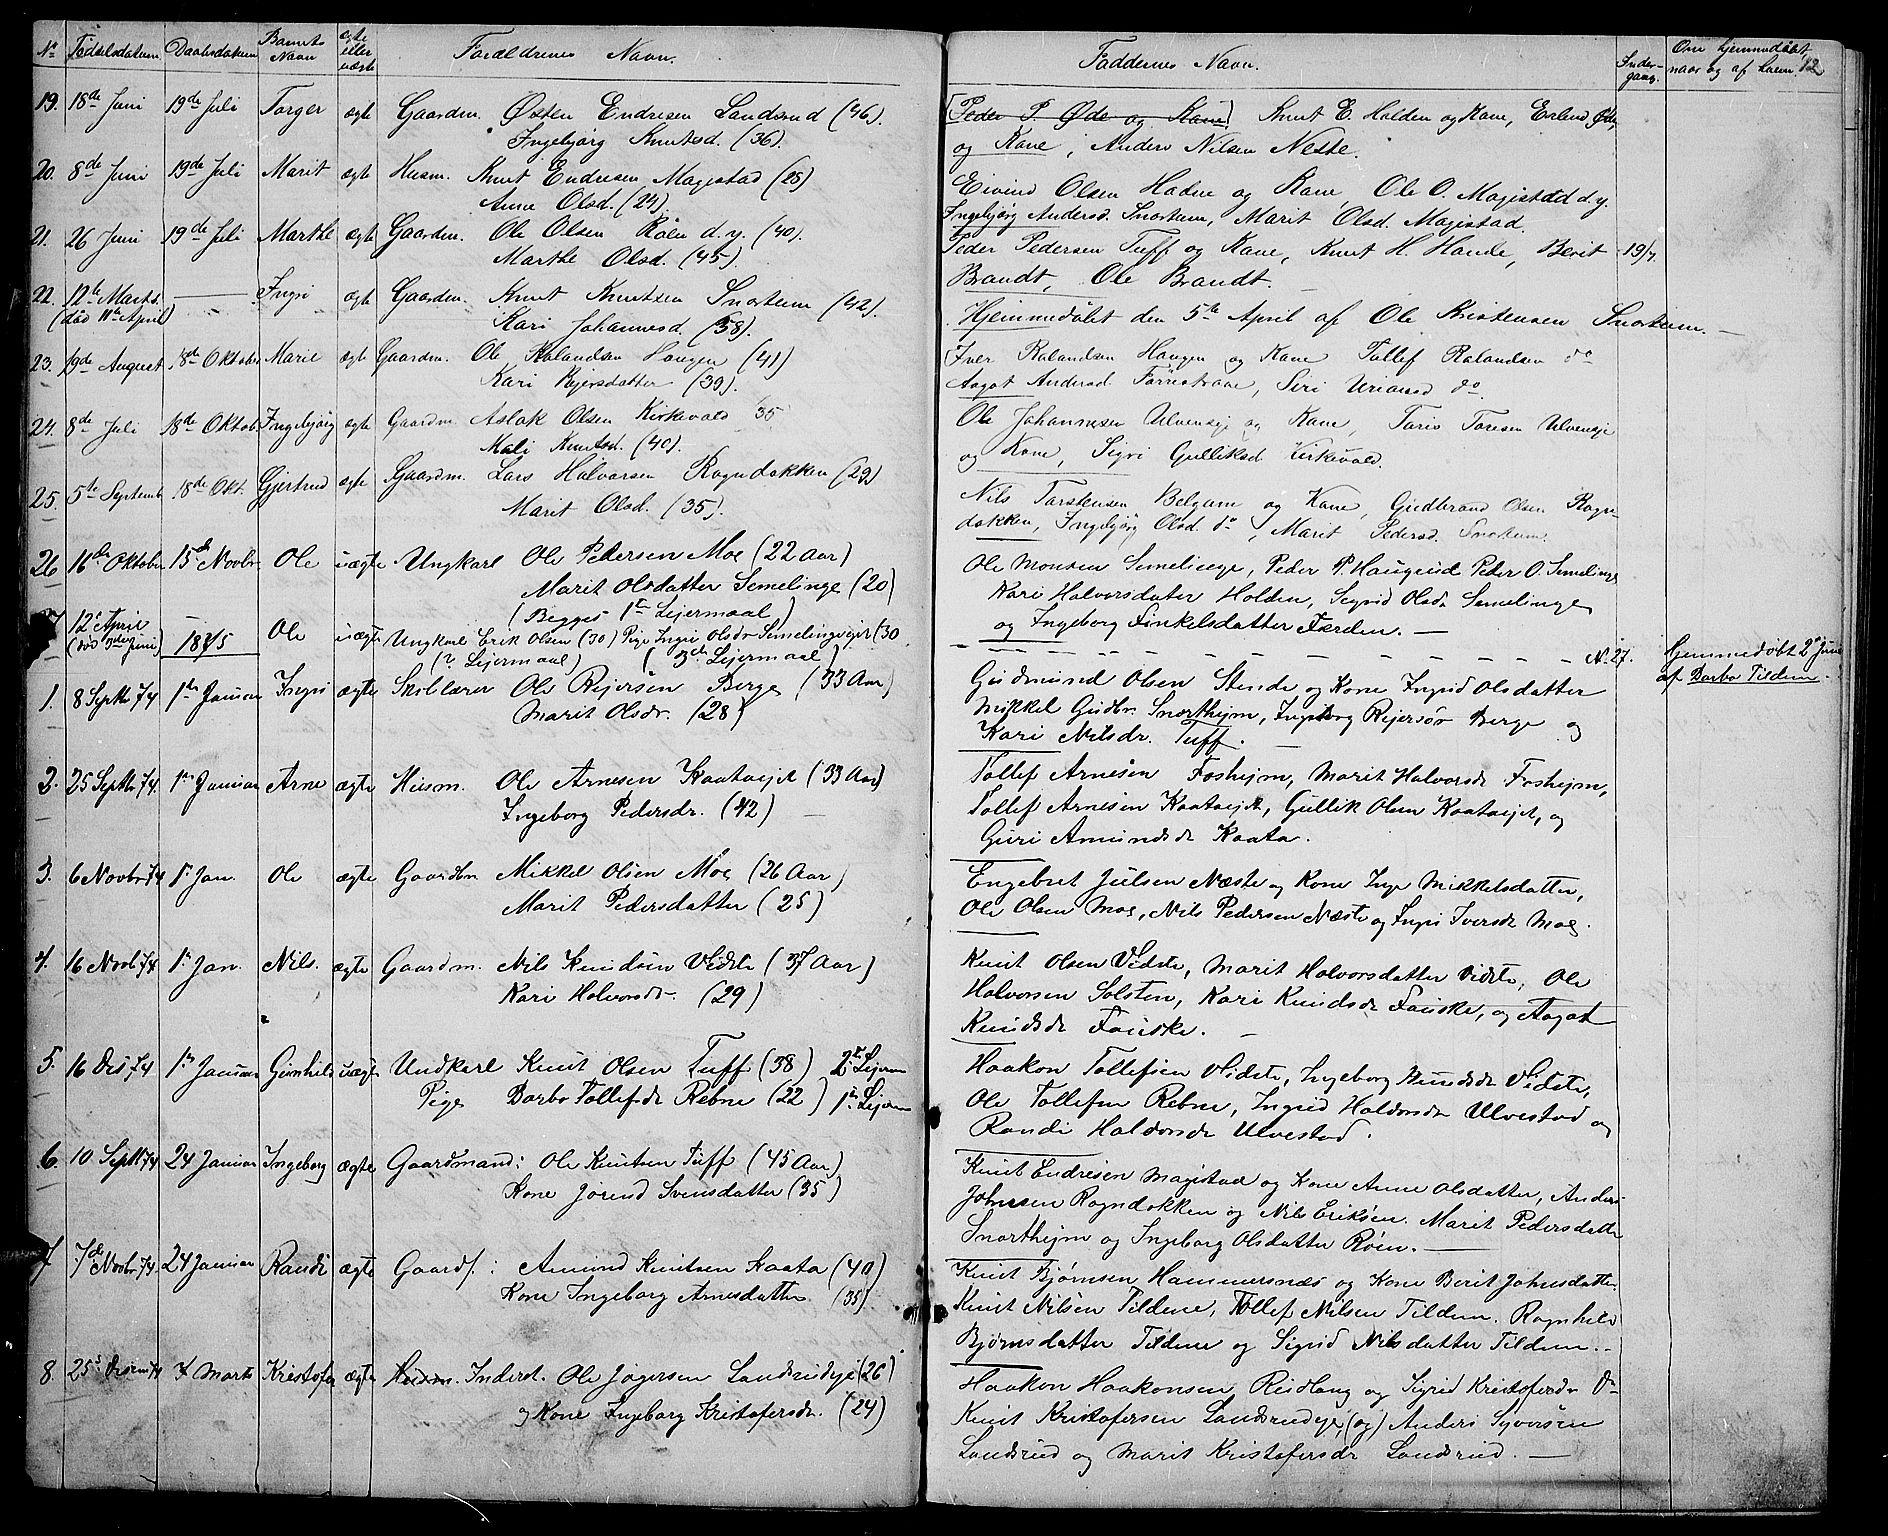 SAH, Vestre Slidre prestekontor, Klokkerbok nr. 3, 1869-1882, s. 12